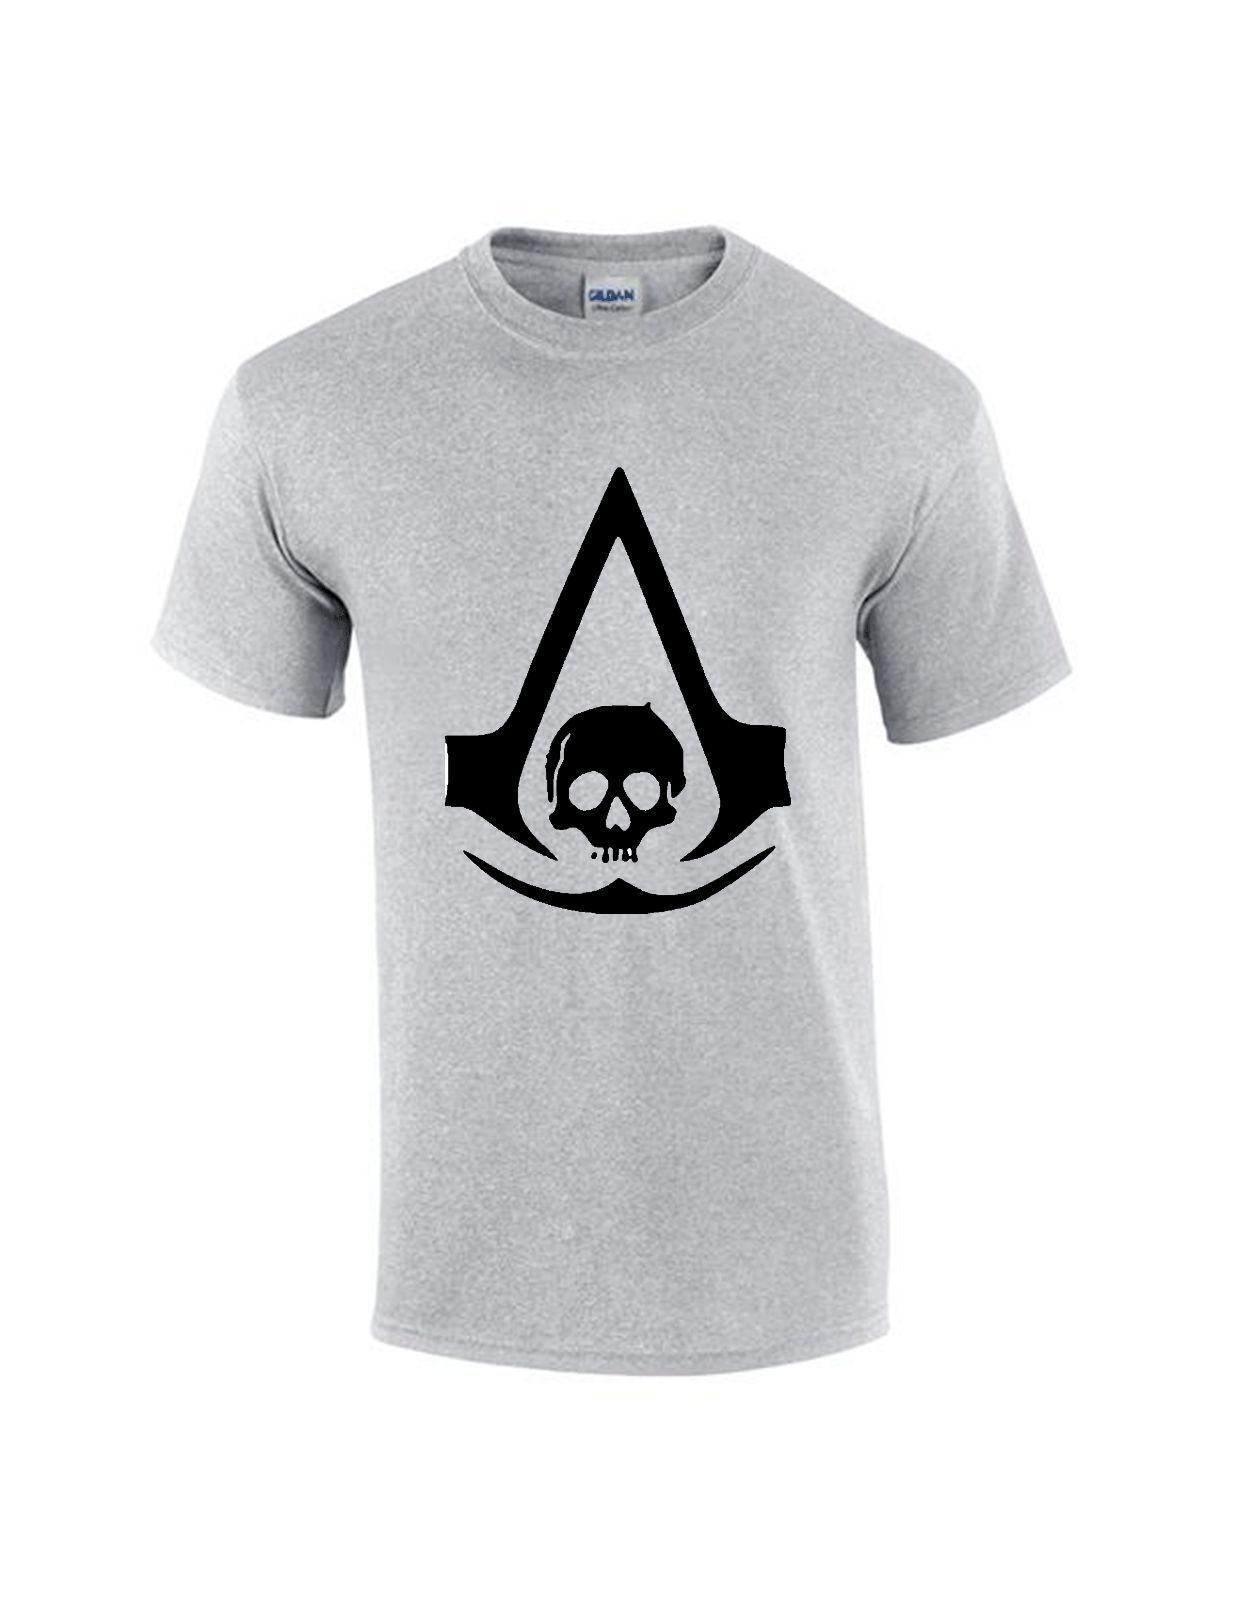 New 2017 Inspired Assassin Creed Men T Shirt Reasonable Wholesale